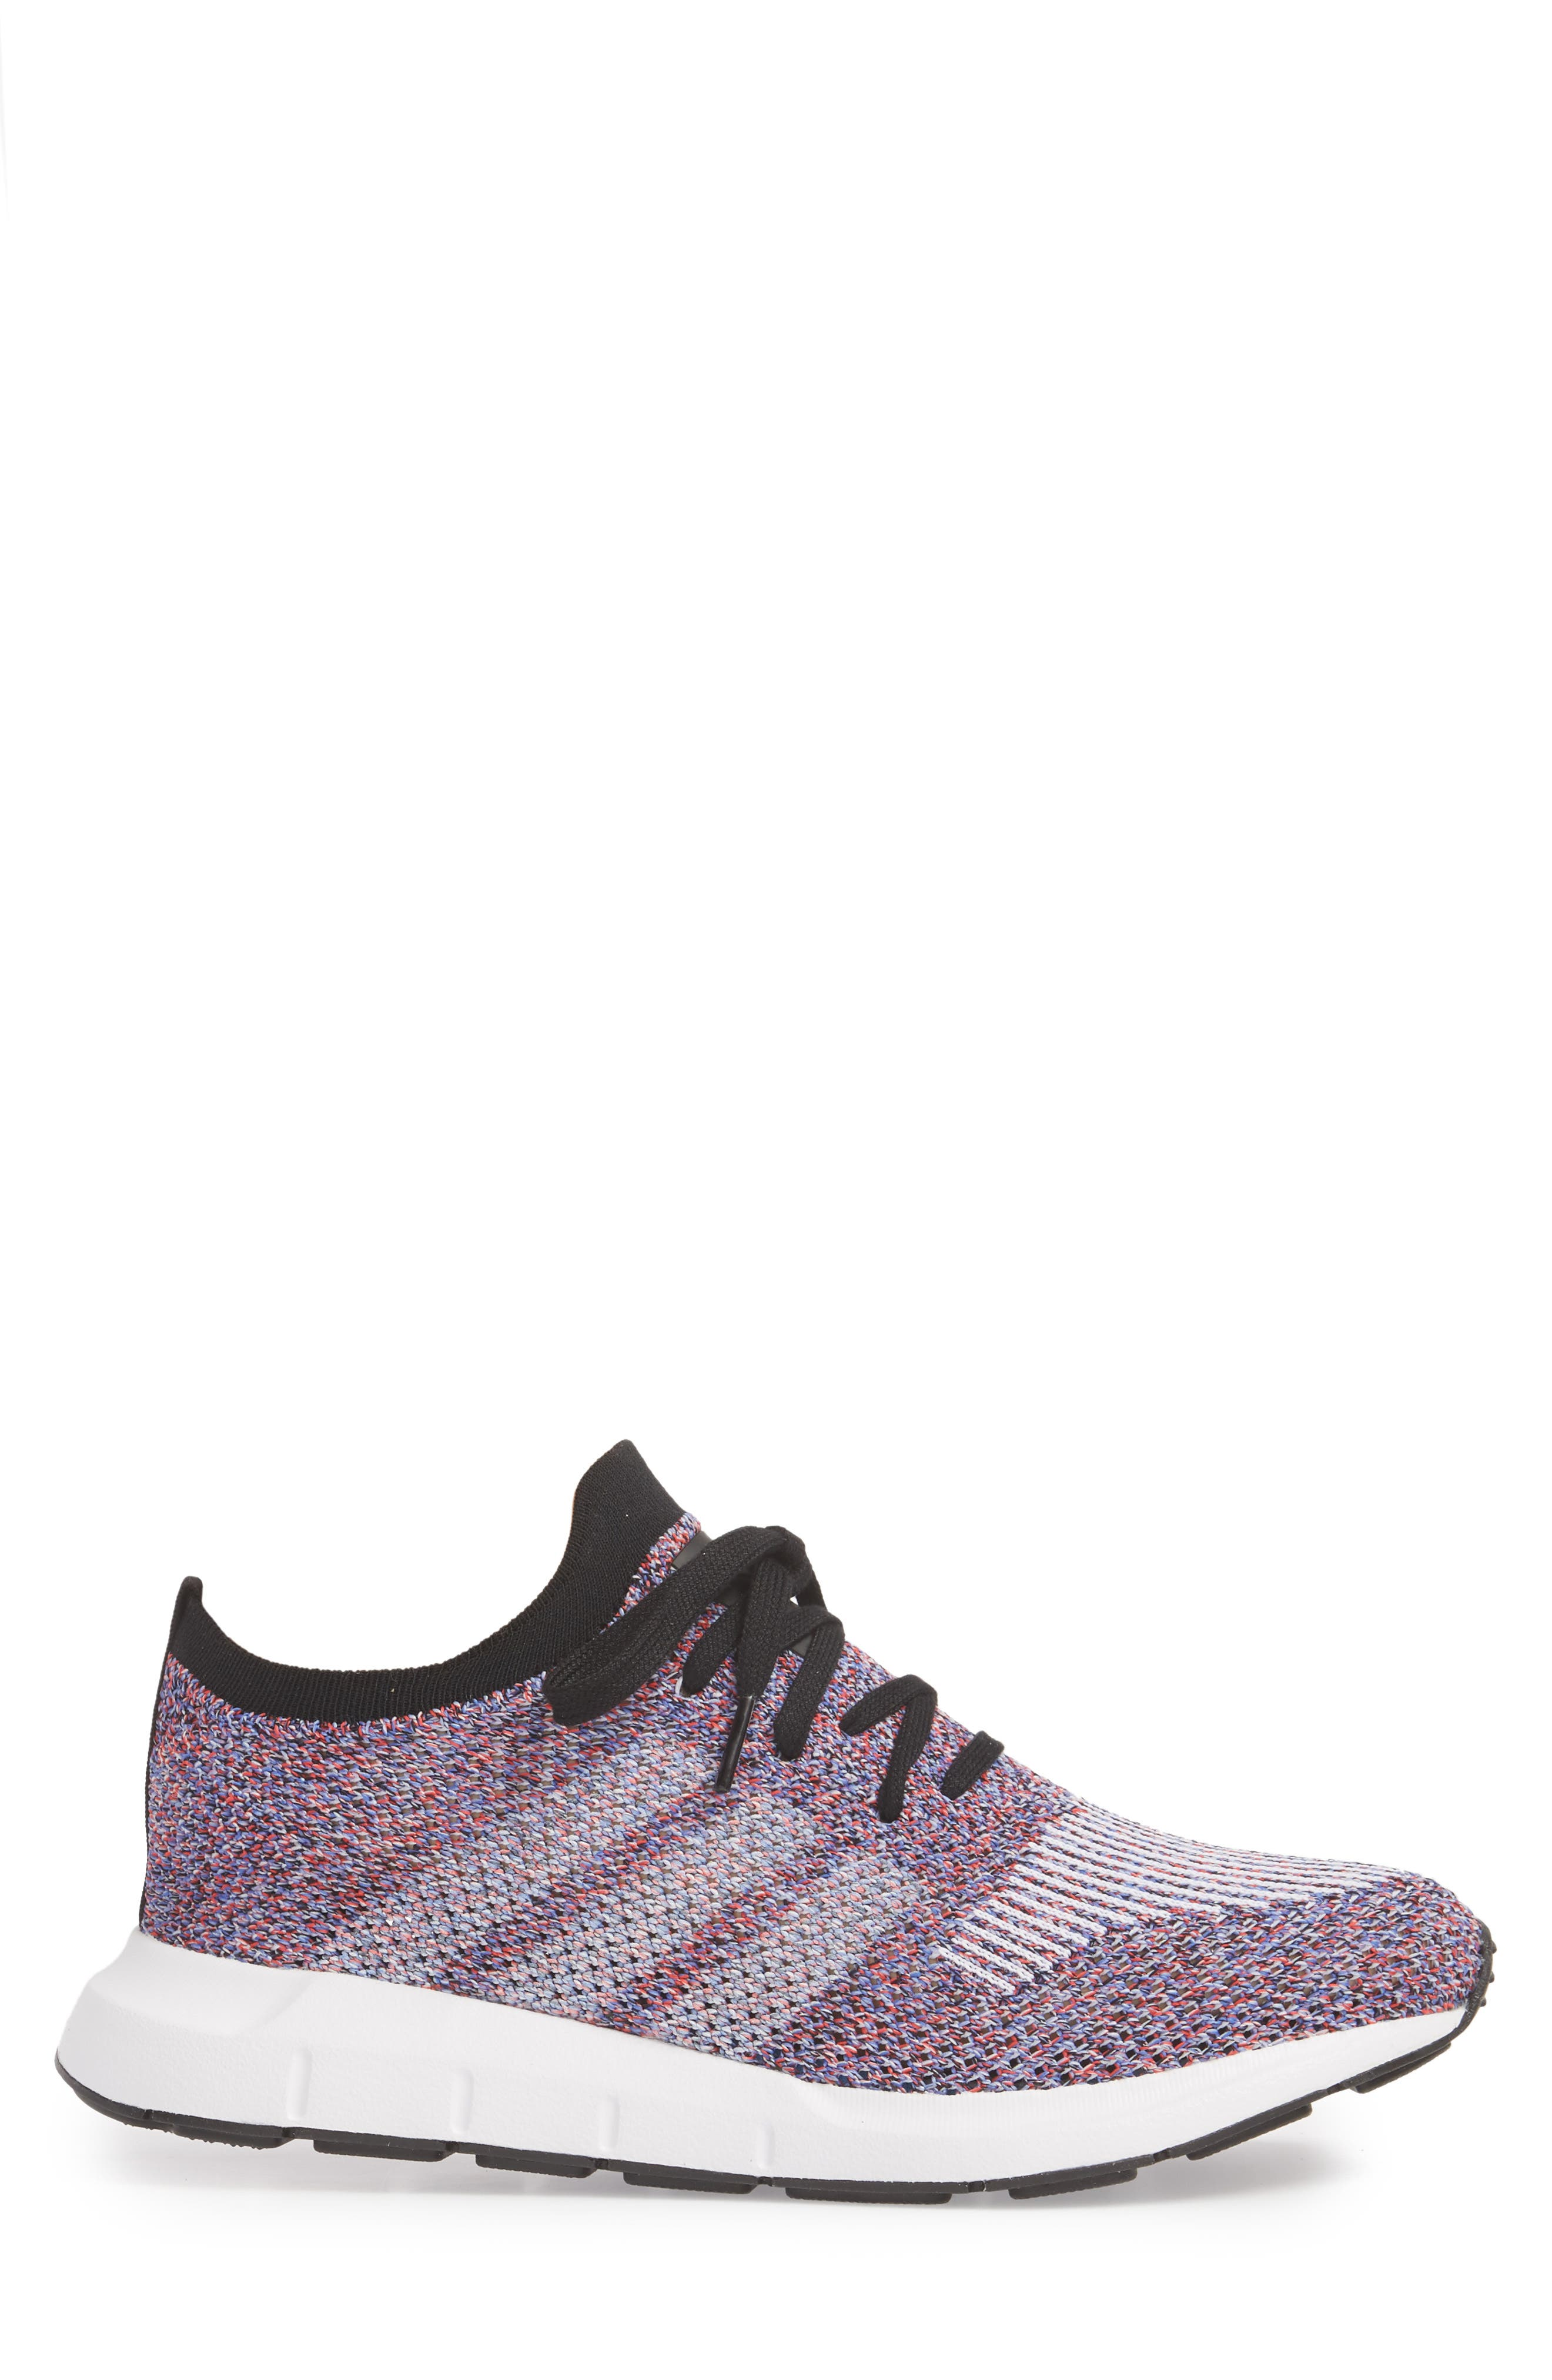 Swift Run Primeknit Sneaker,                             Alternate thumbnail 3, color,                             White/ Purple/ Black